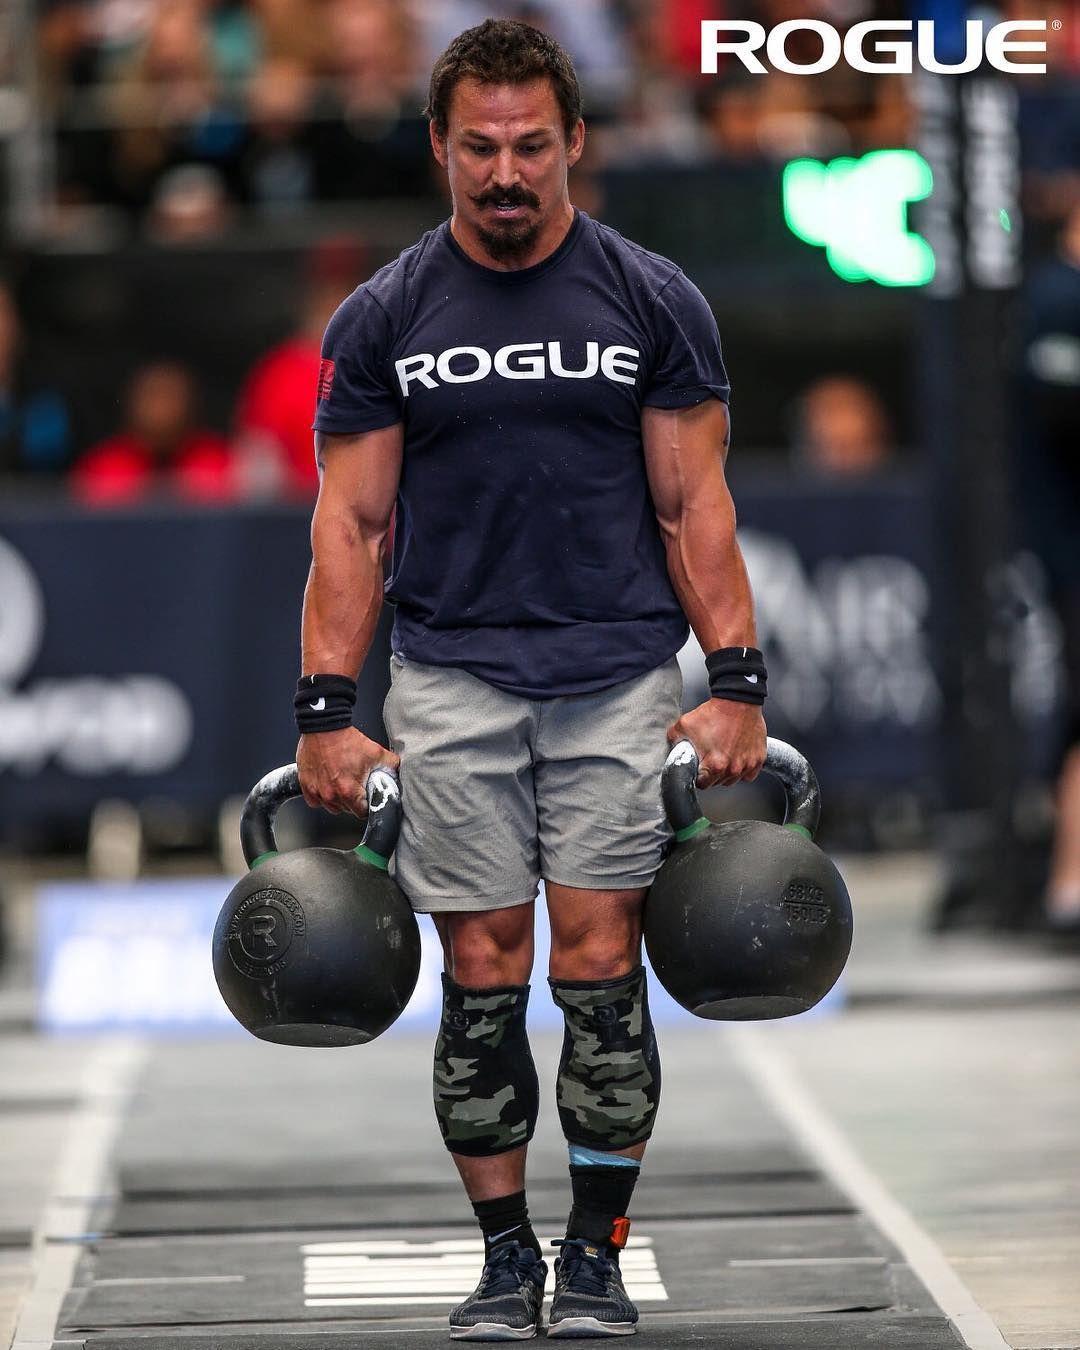 c0e6ea3852f Rogue Fitness